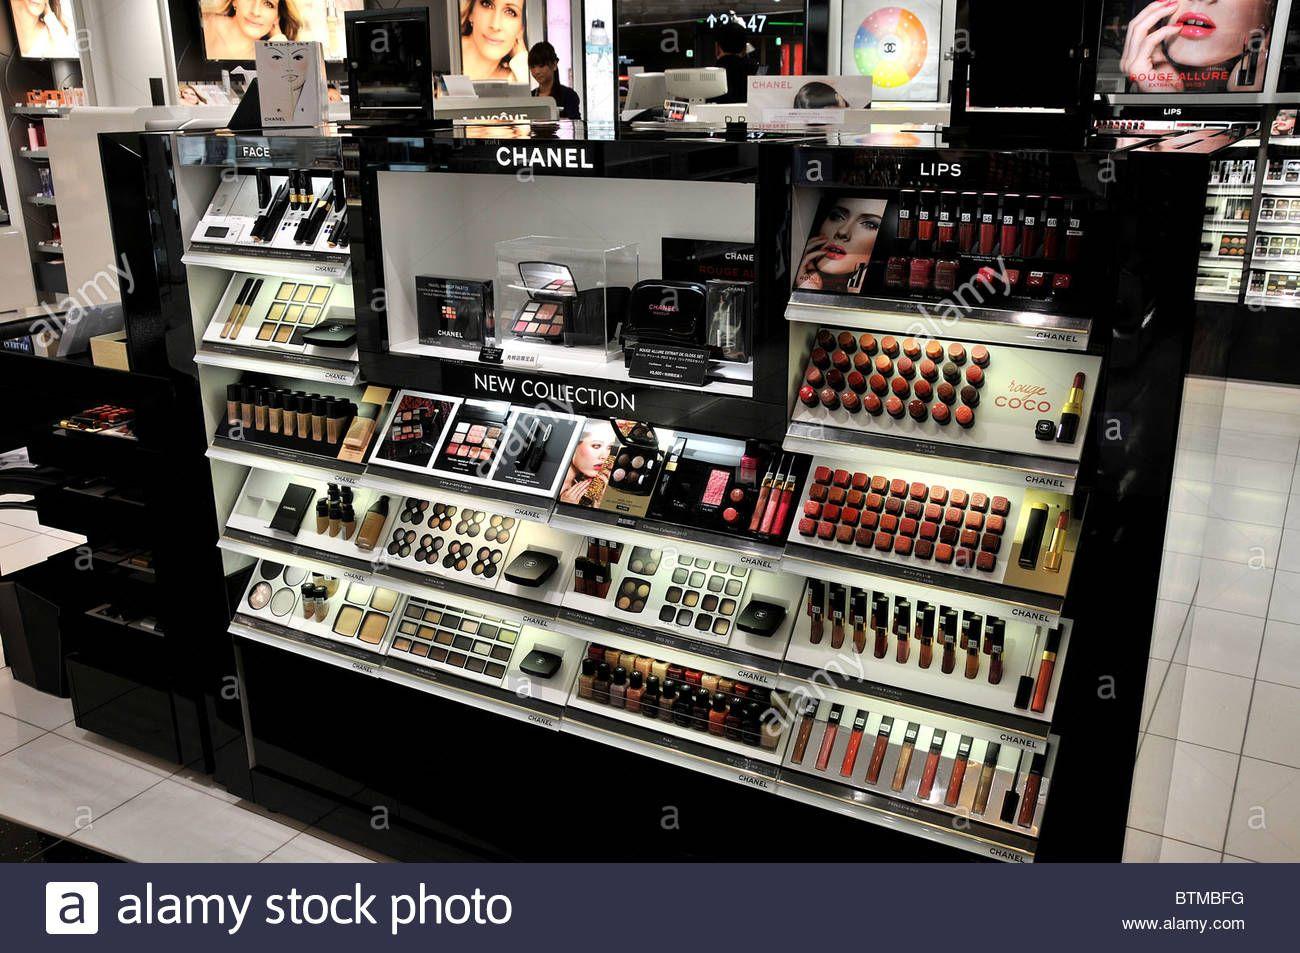 Chanel Cosmetics Duty Free Shop Narita Airport Japan Btmbfg Jpg 1300 953 Chanel Cosmetics Stock Photos Cosmetic Shop